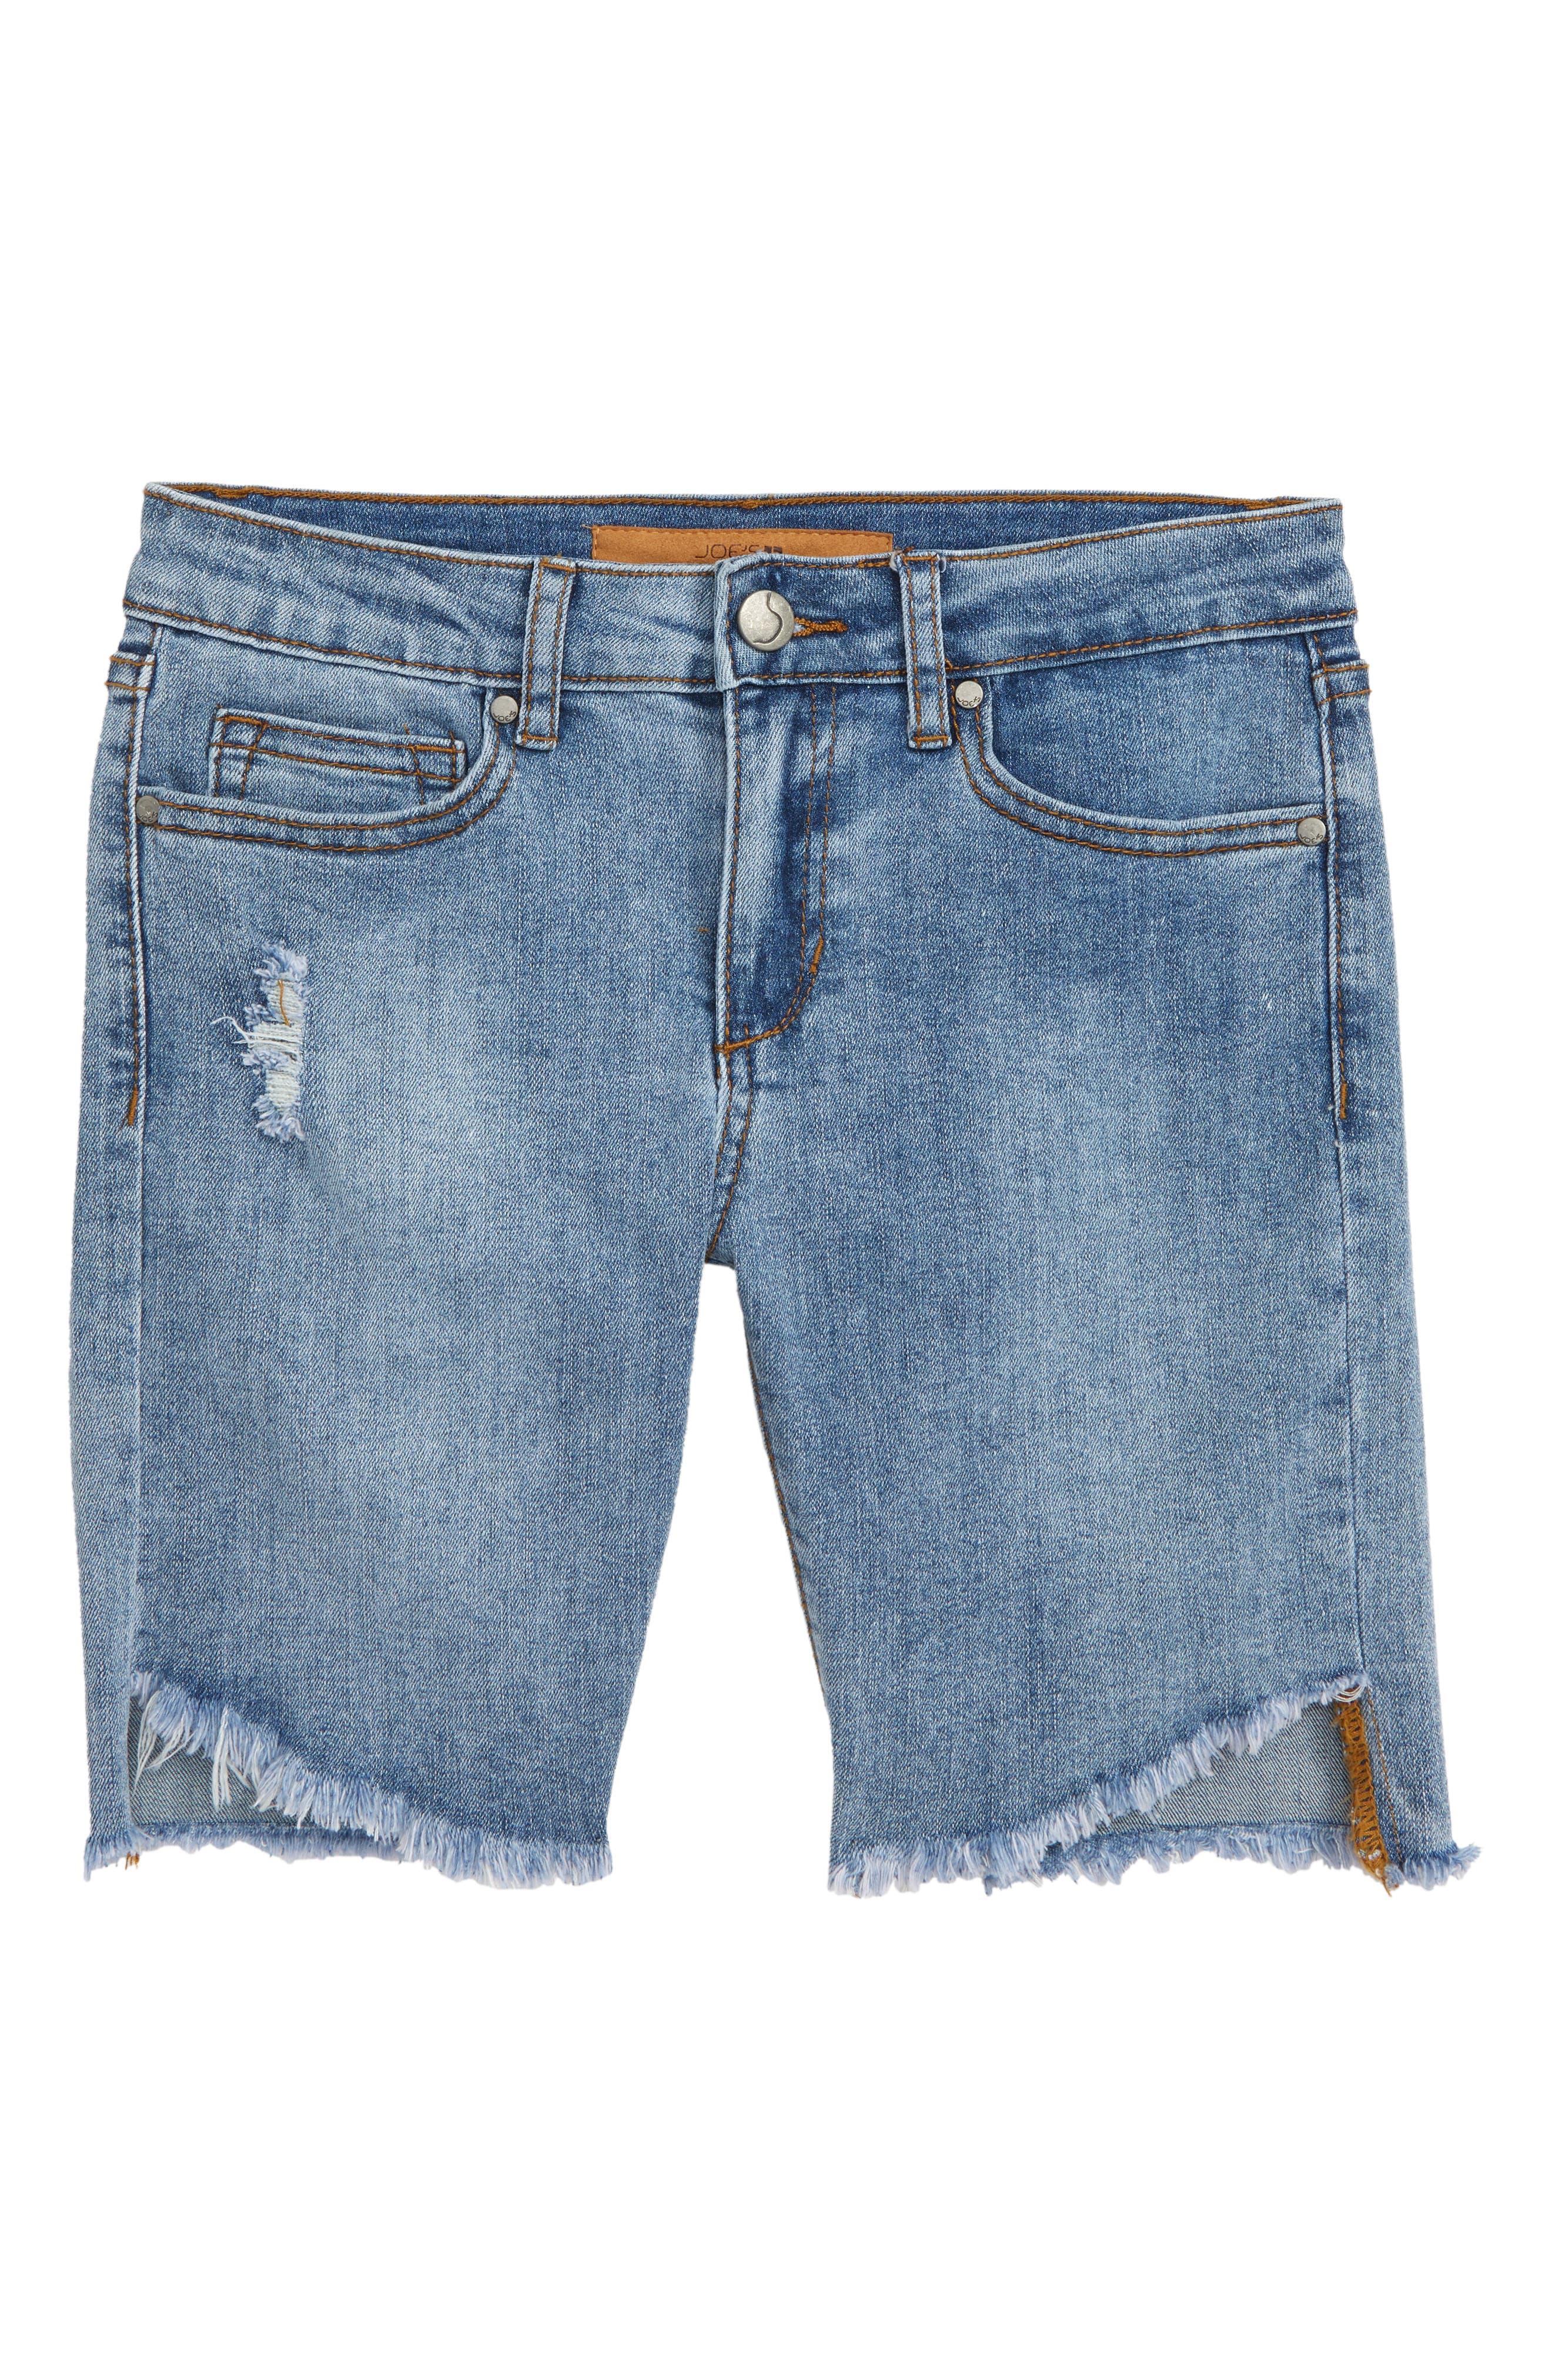 JOE'S The Finn Cutoff Denim Bermuda Shorts, Main, color, THOMPSON